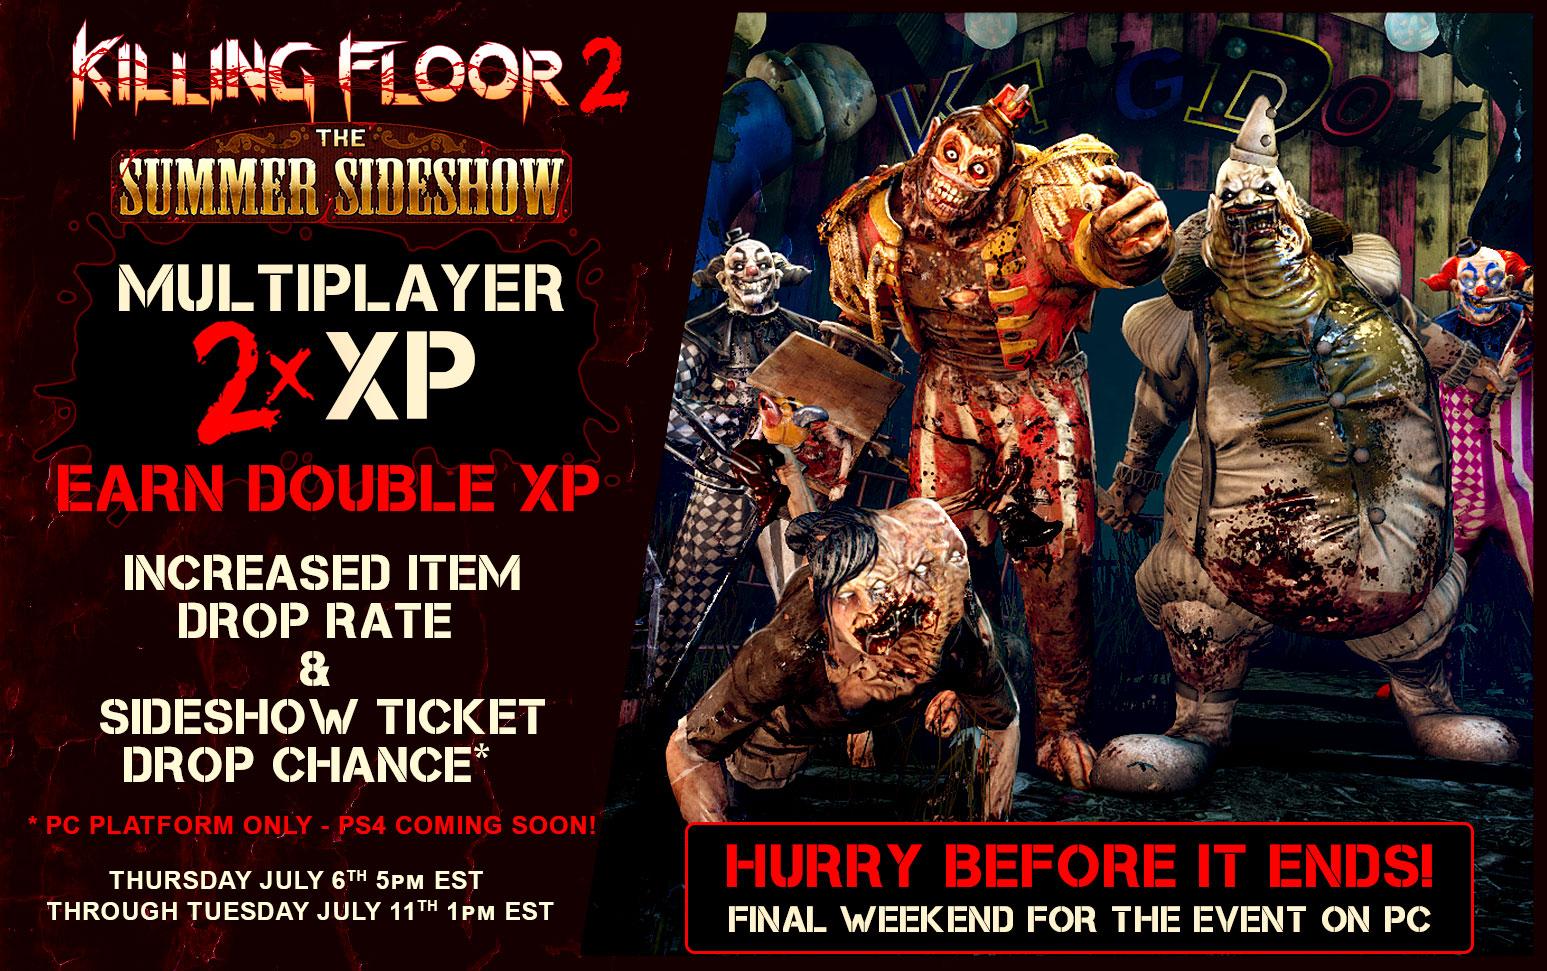 Killing Floor 2 - Последняя неделя шоу и 2хр